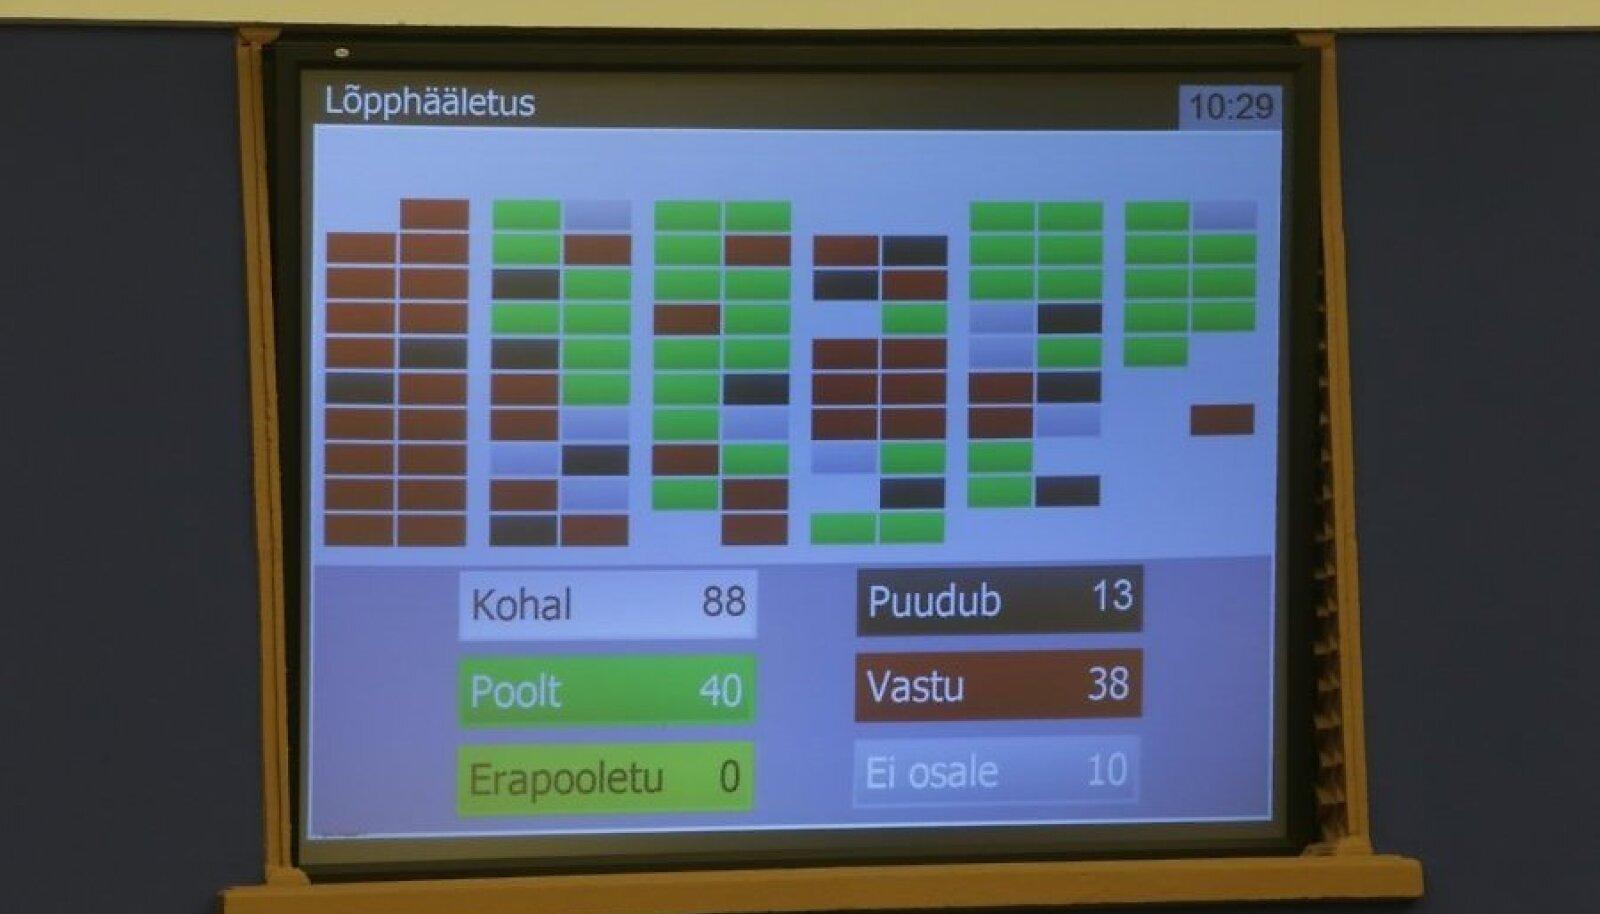 Voting on gender-neutral partnership bill